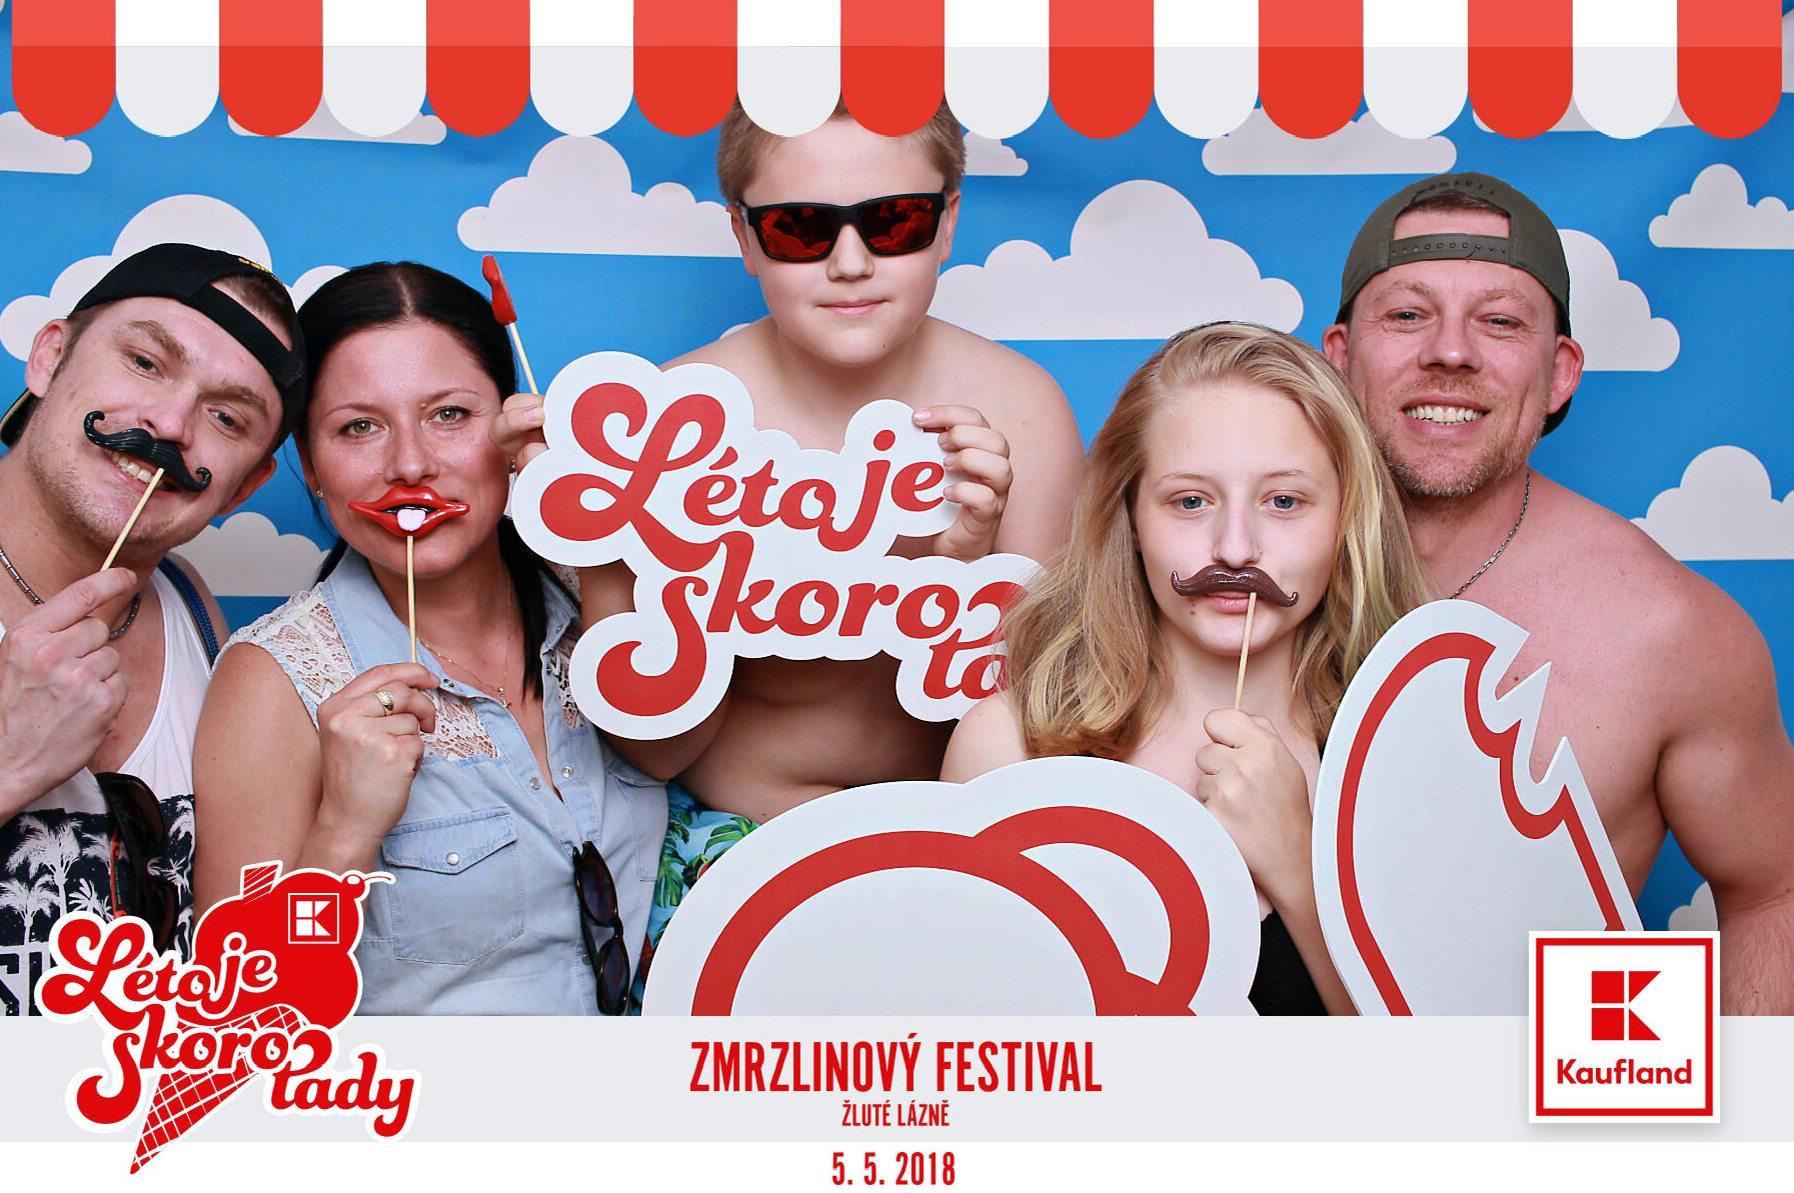 fotokoutek-festival-zlin-kaufland-zmrzlinovy-festival-5-5-2018-416920